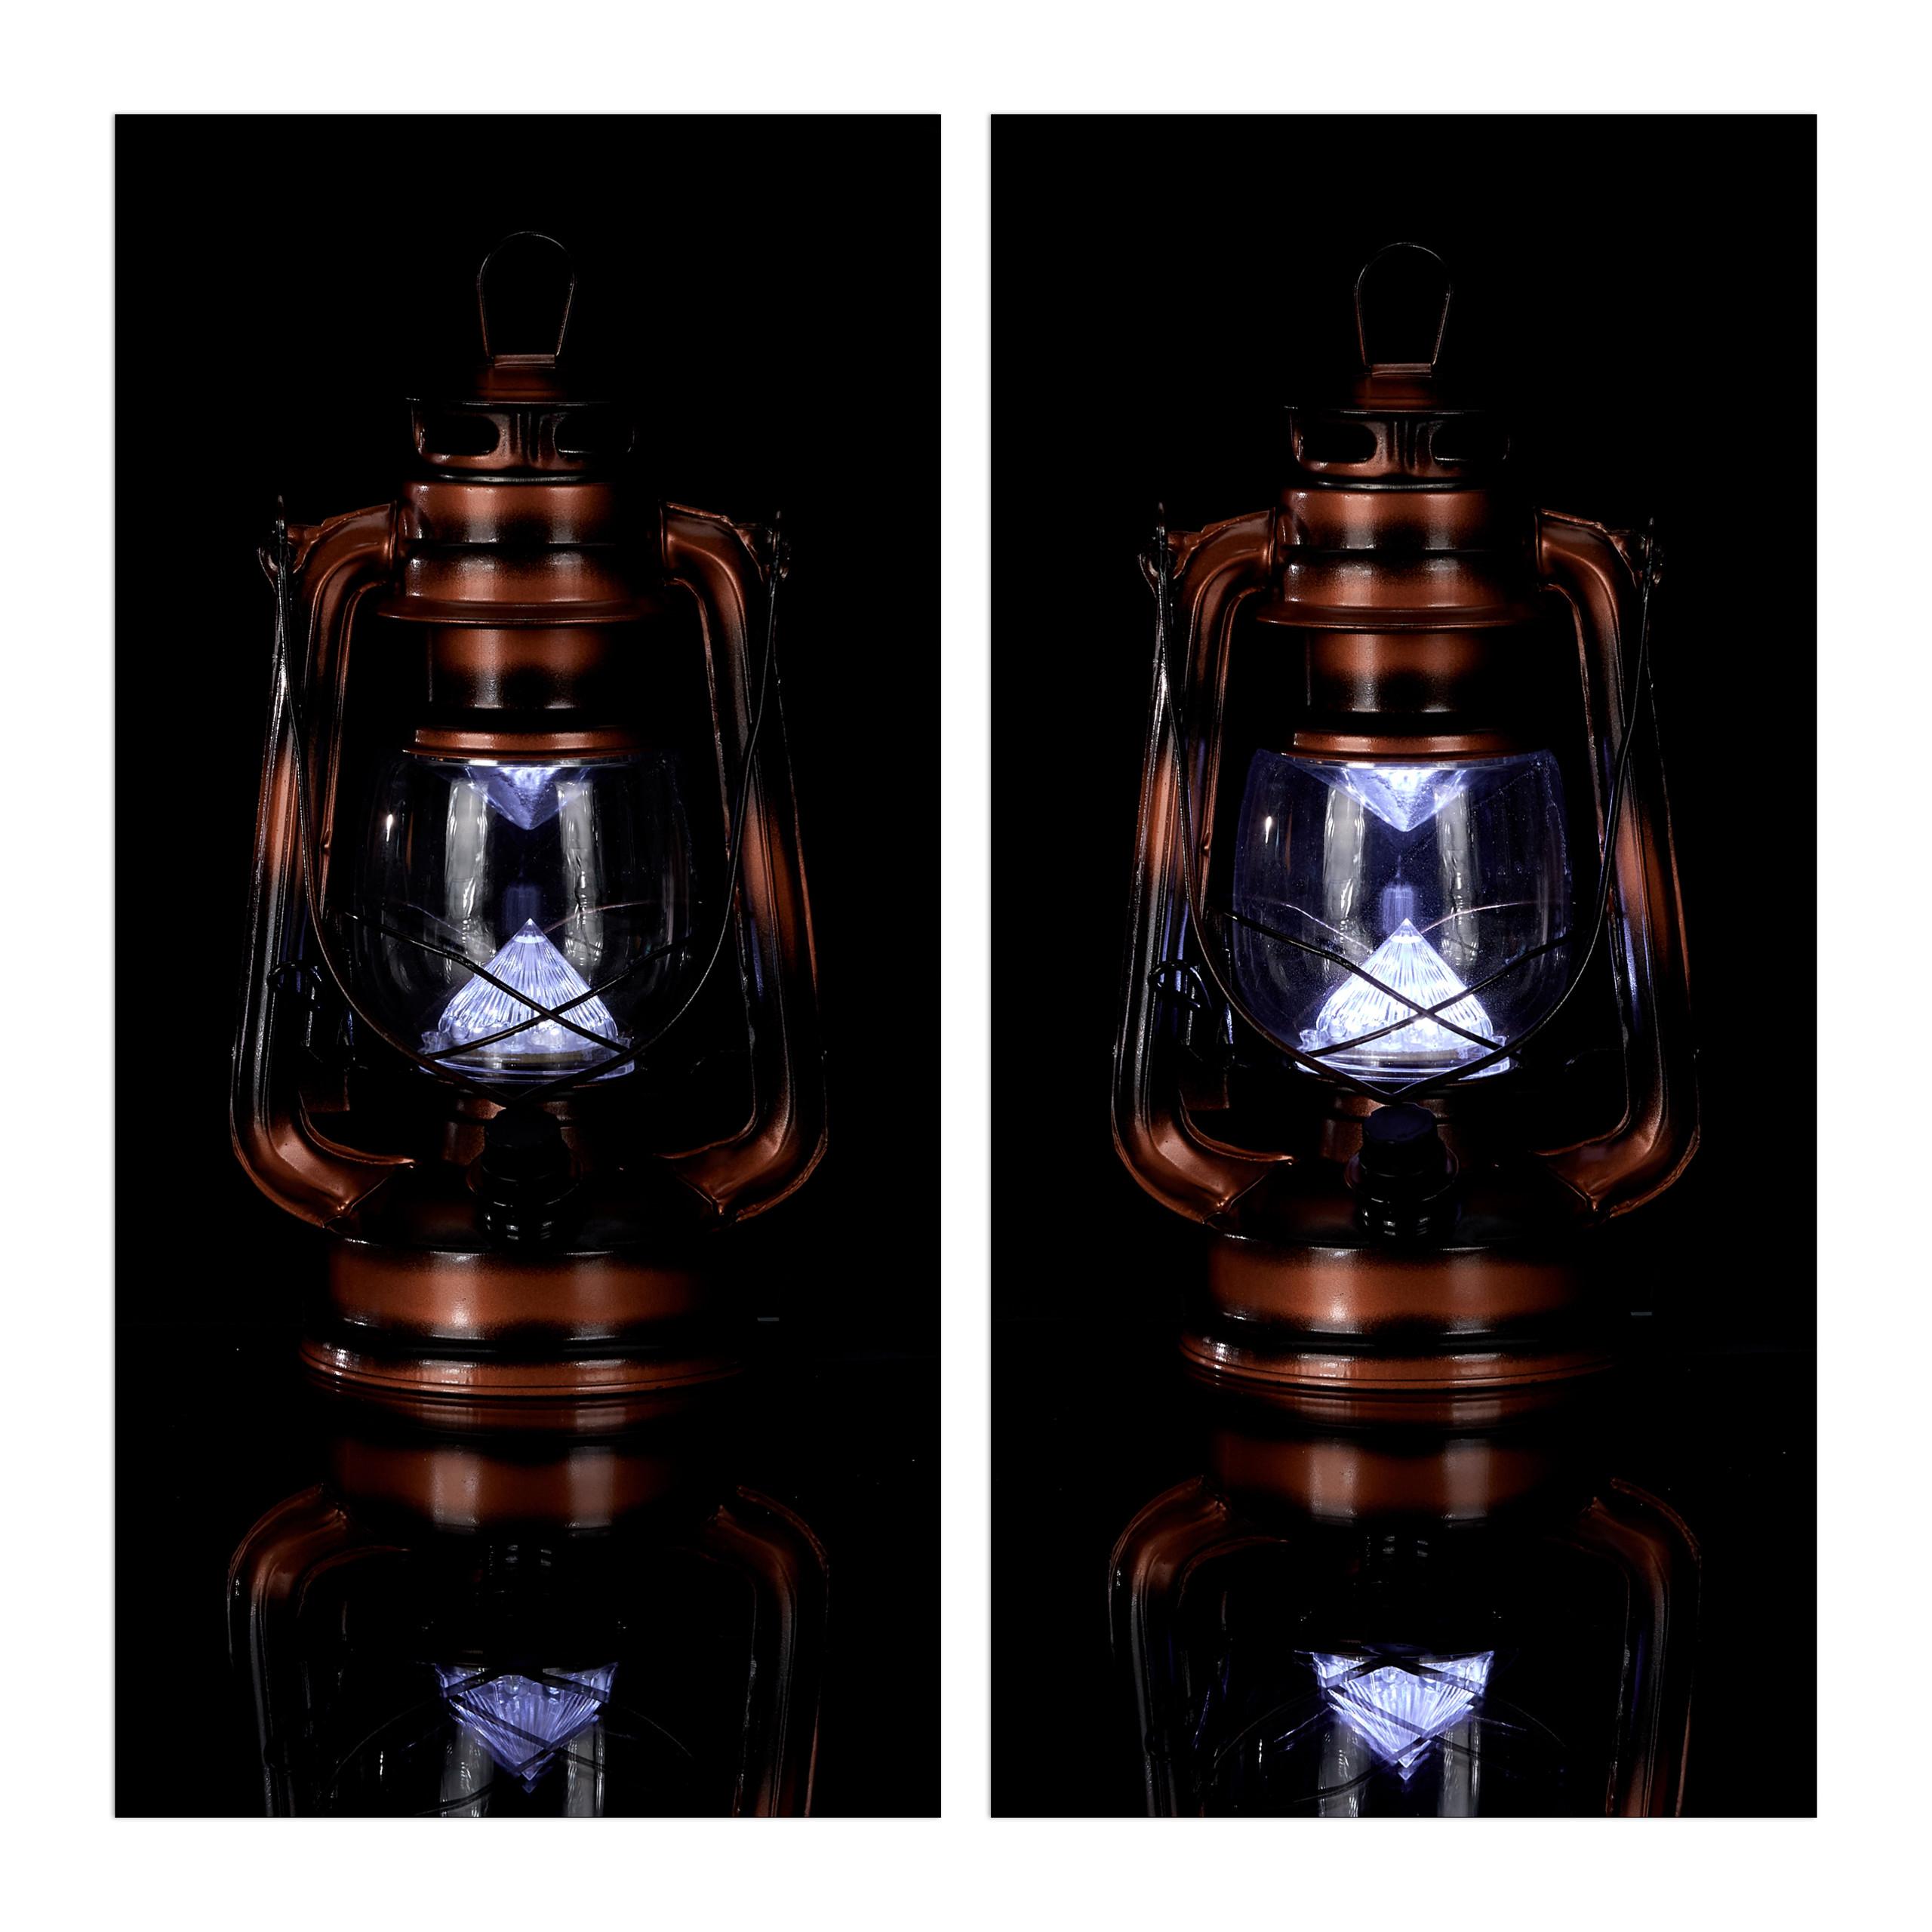 LED Laterne 2 x Sturmlaterne kupfer Gartenlaterne Campinglaterne Sturmlampe